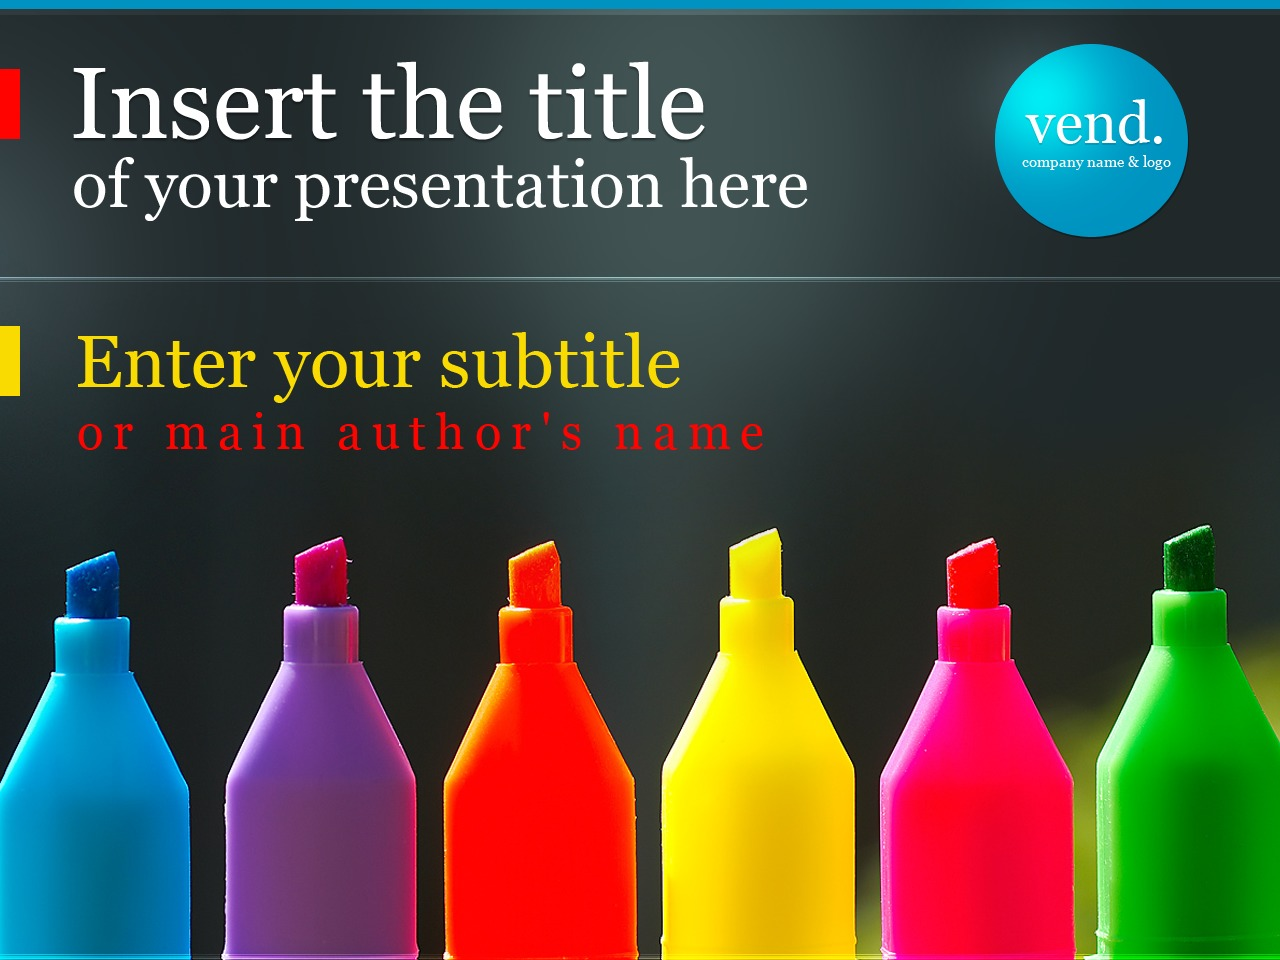 PowerPoint шаблон №24224 на тему бизнес и услуги